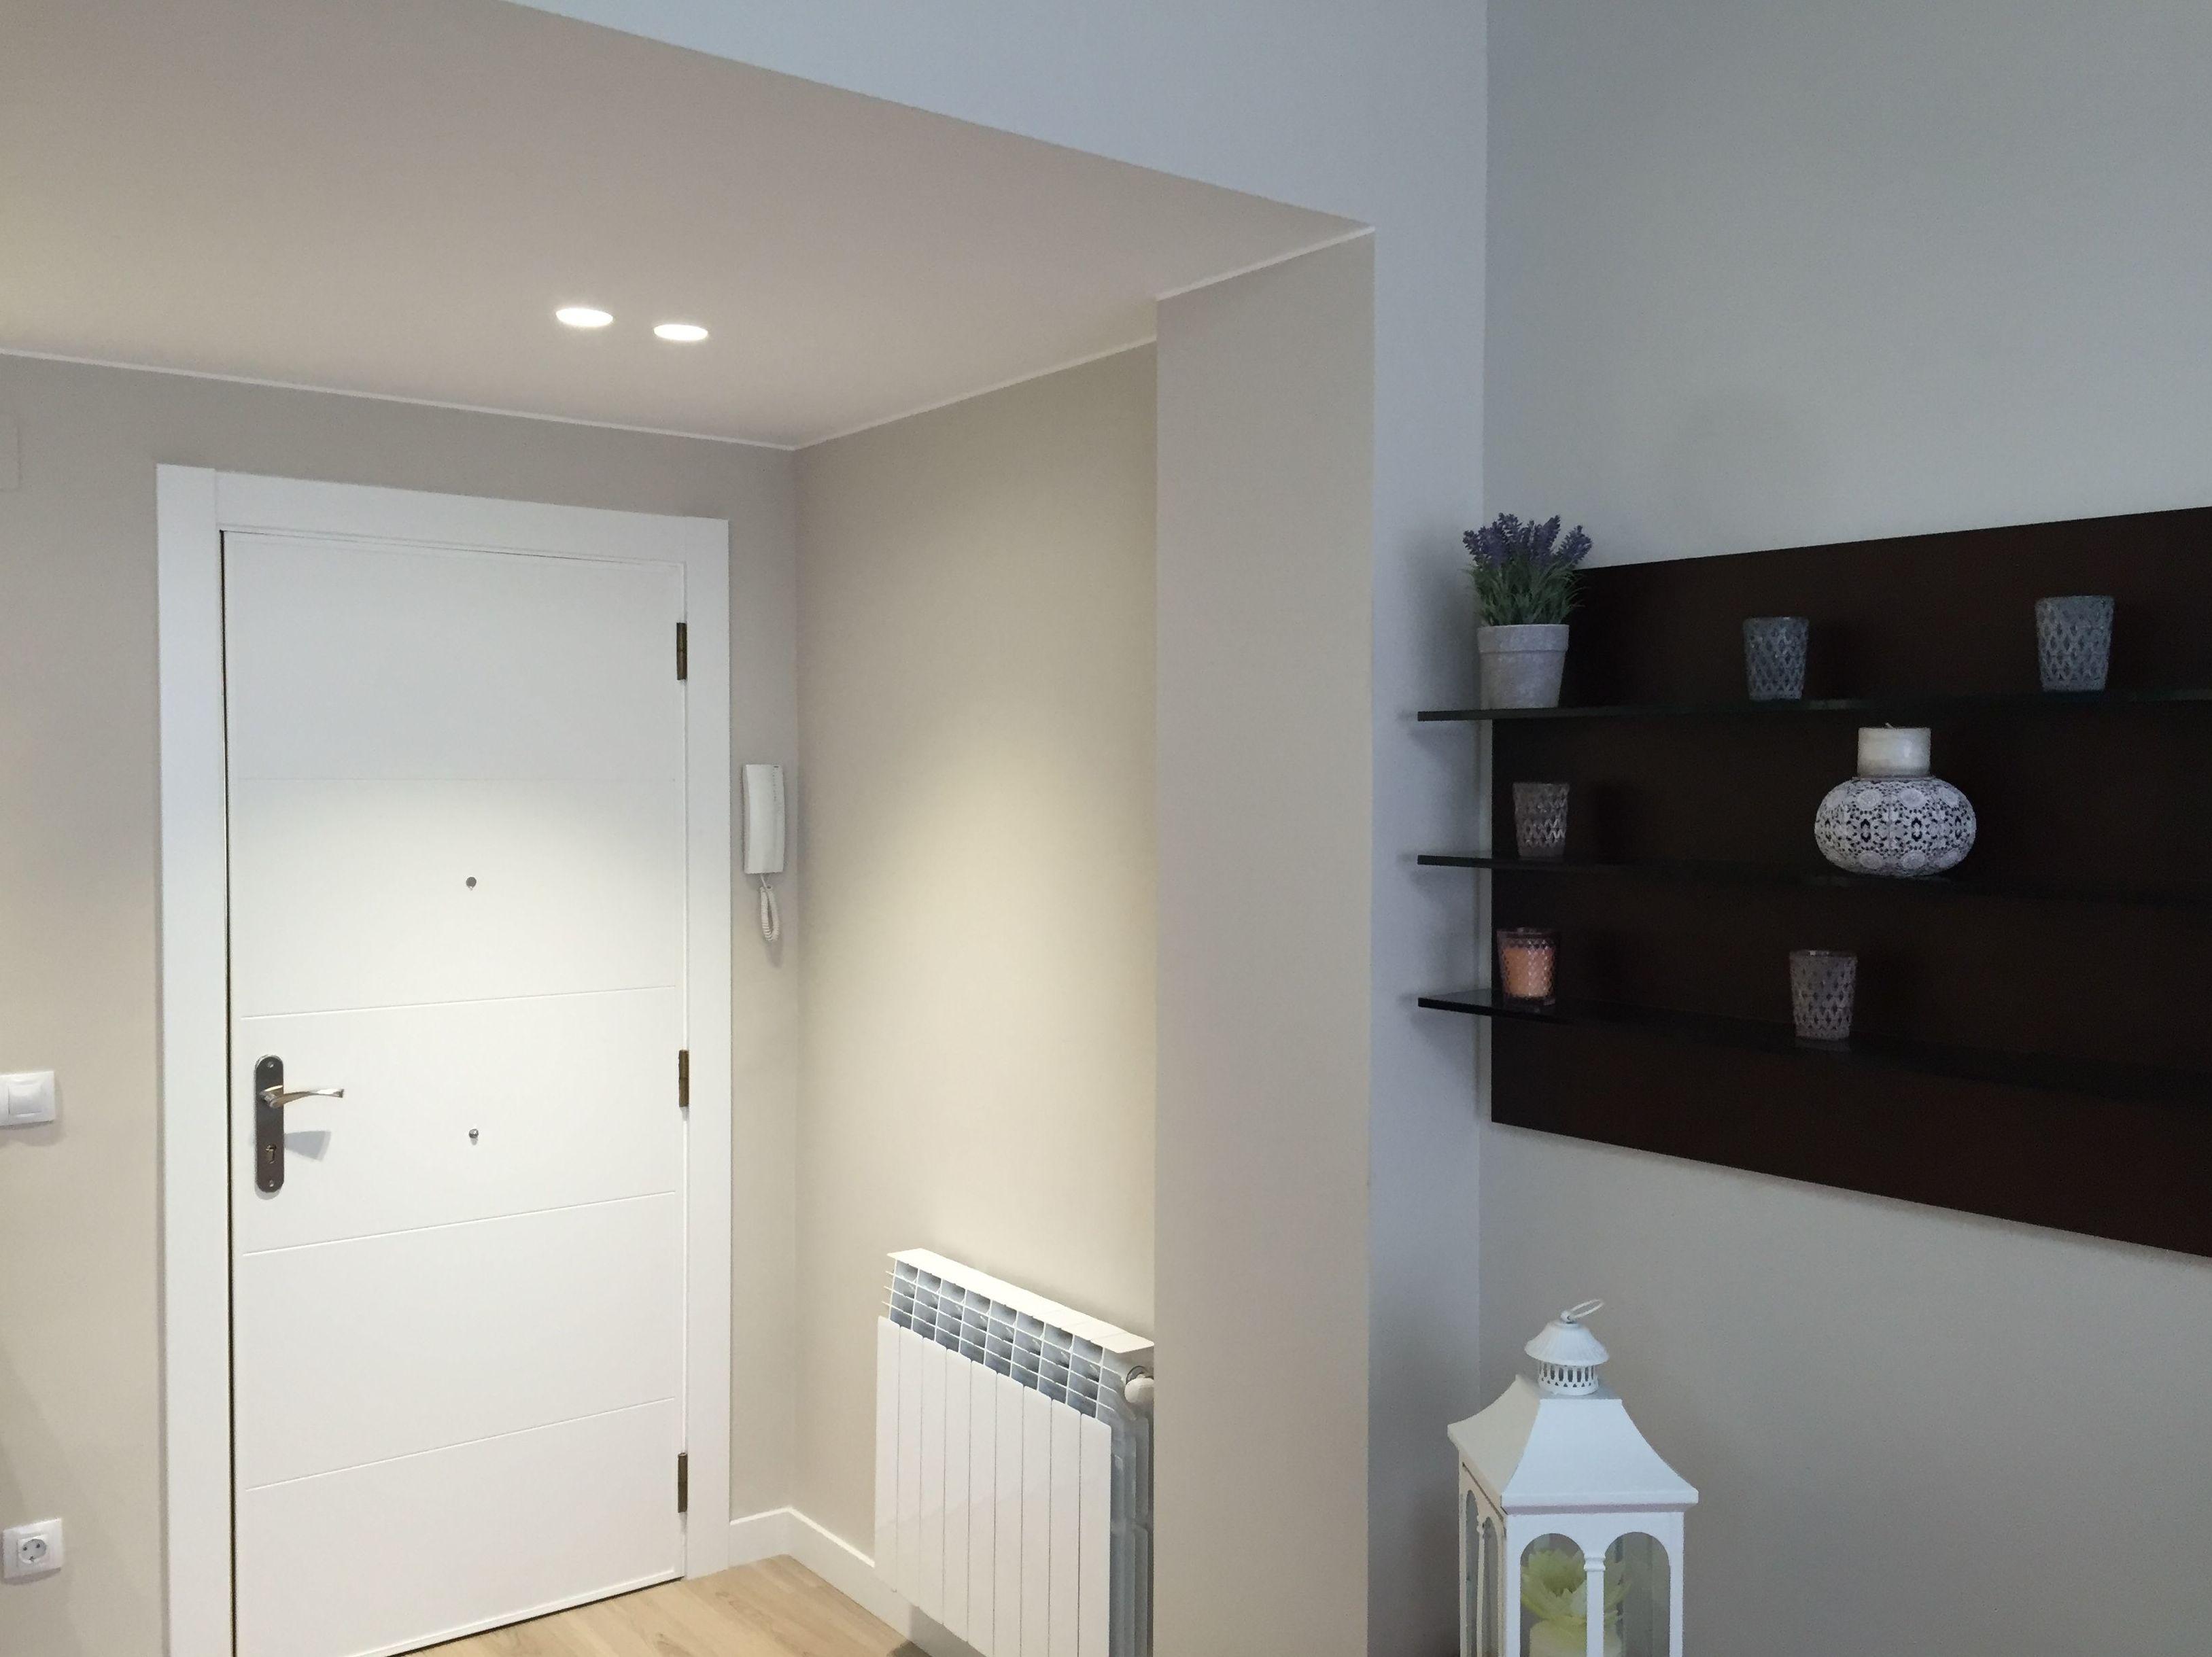 Entrada vivienda integrada a salon